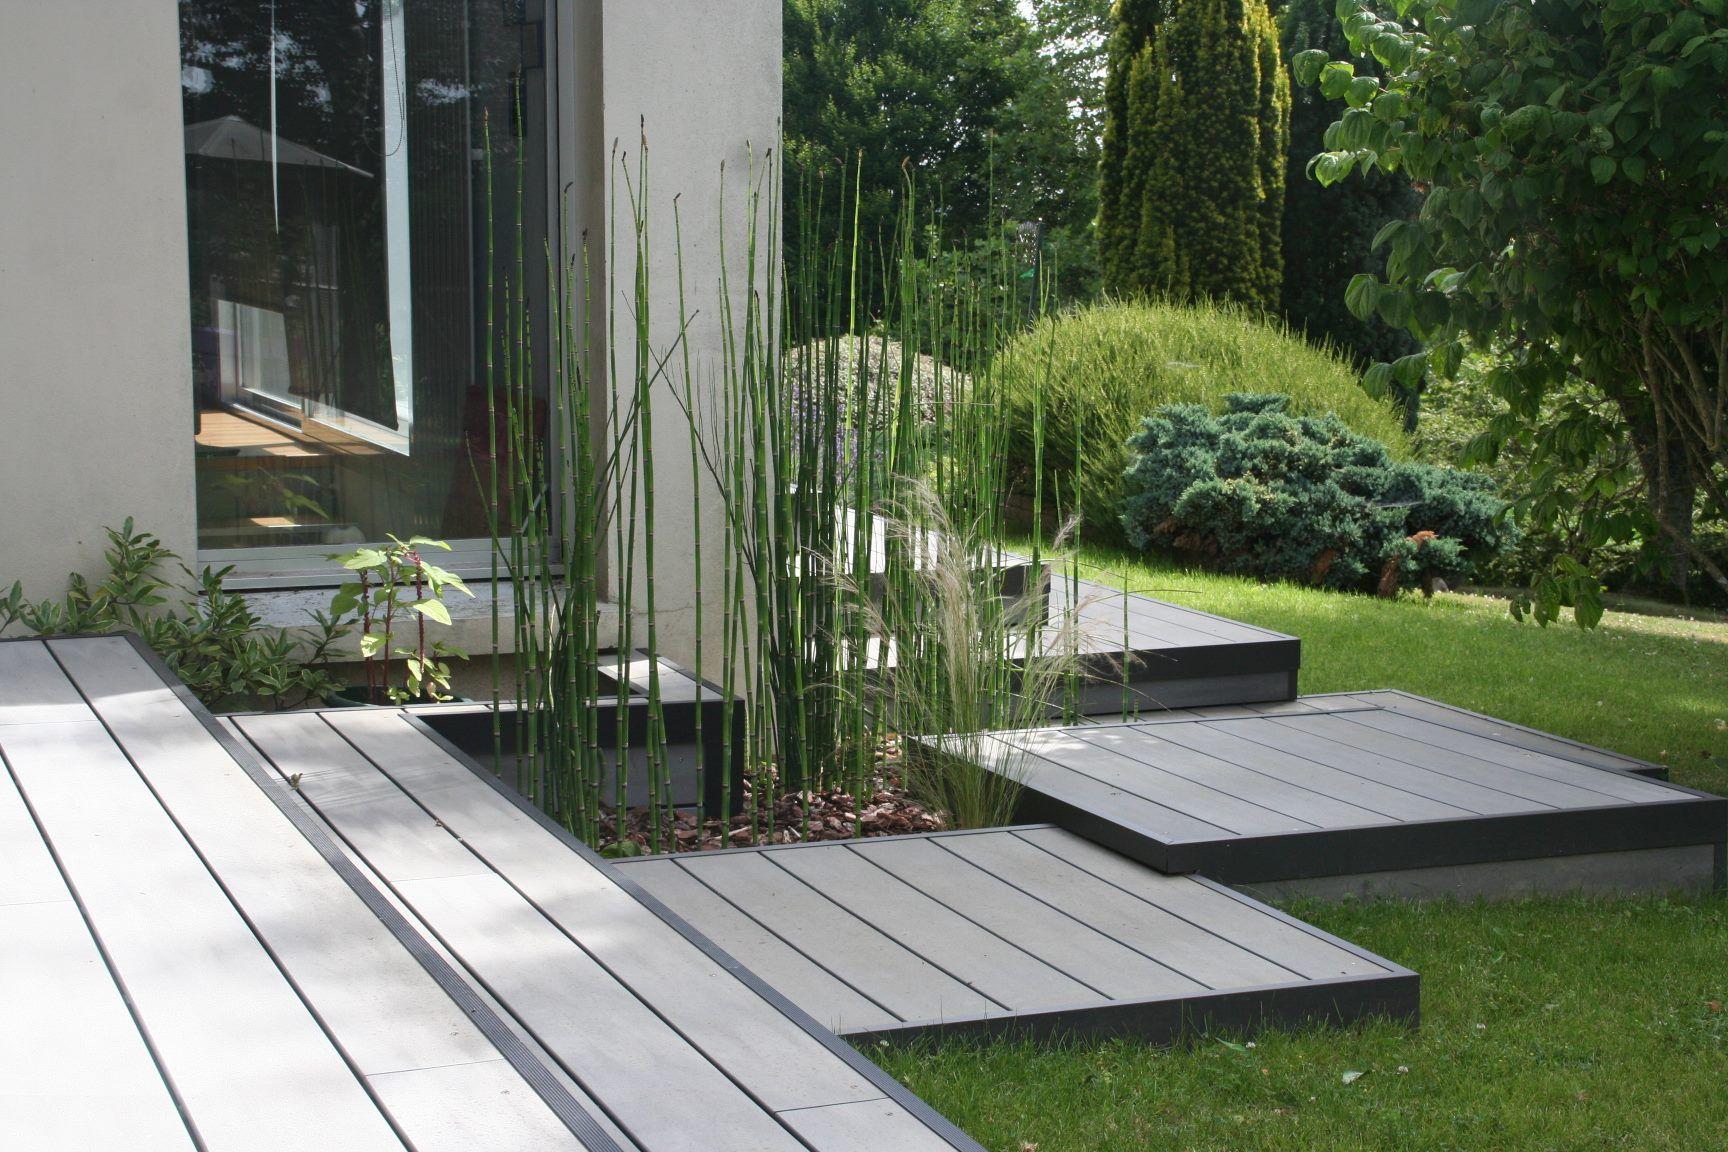 ocewood terrasse composite optima anthracite cr dits eurl olivier dubois terrasses. Black Bedroom Furniture Sets. Home Design Ideas